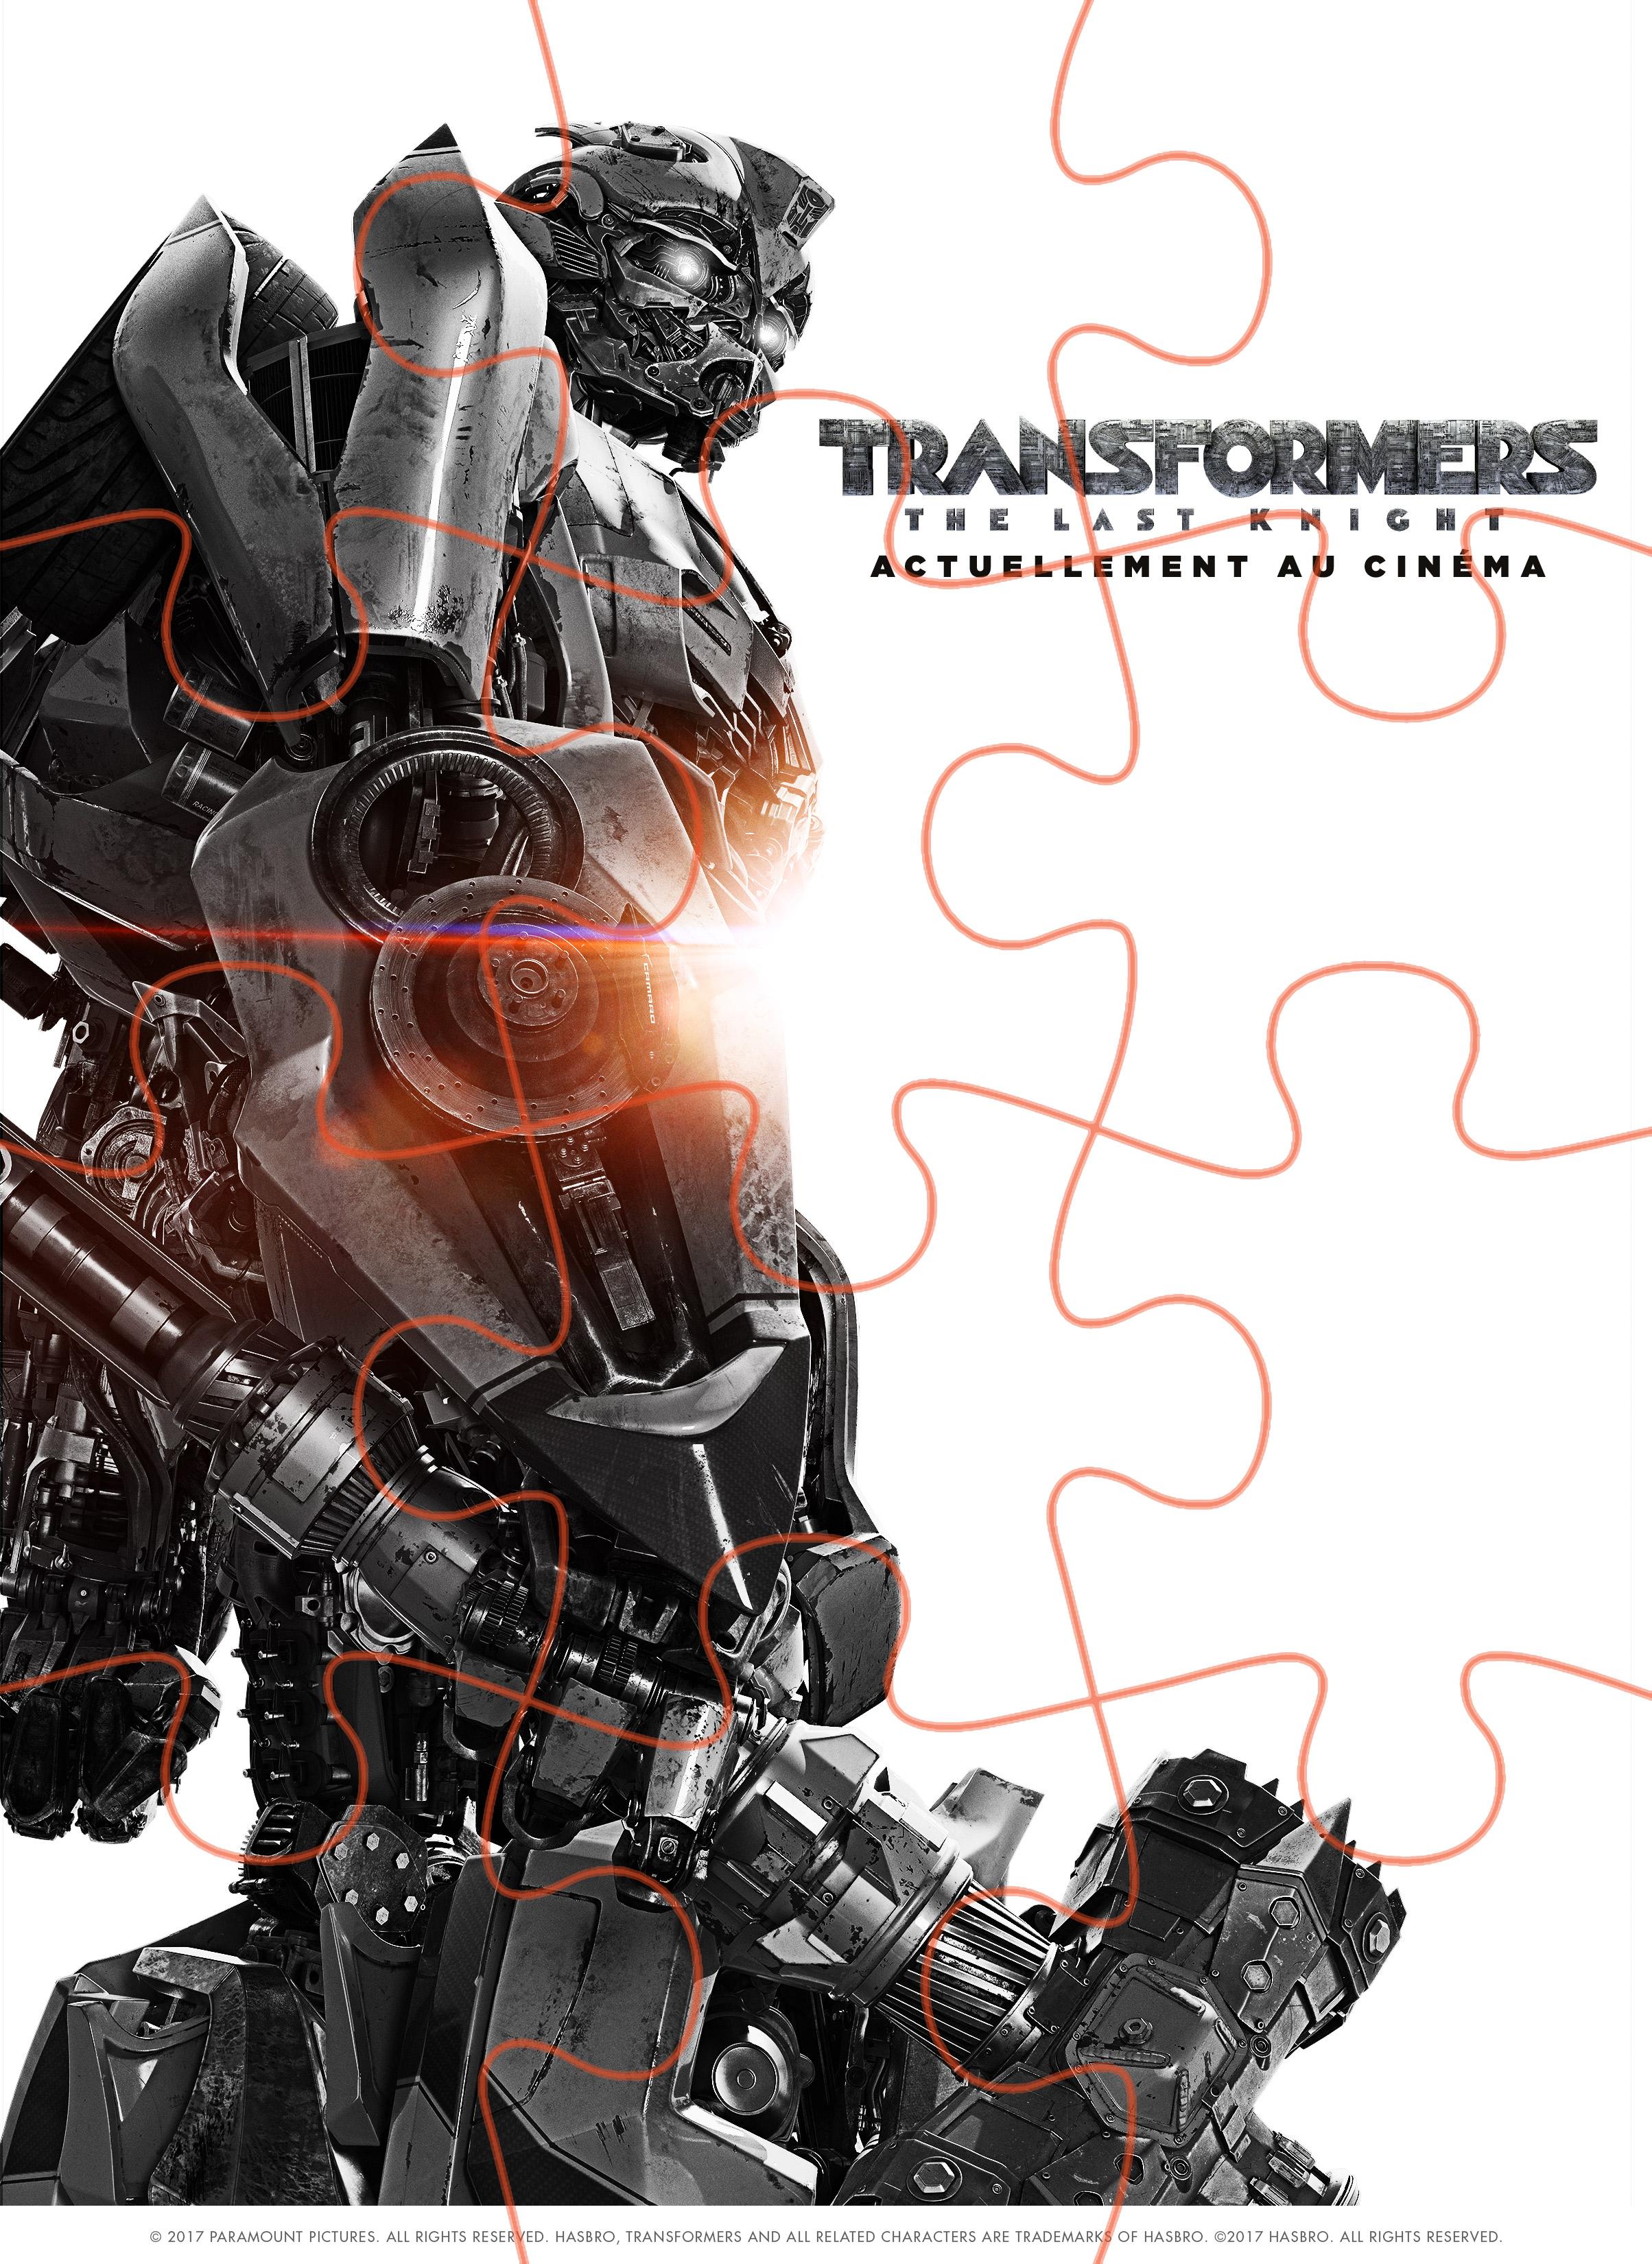 Jeu : Jeux Transformers 2